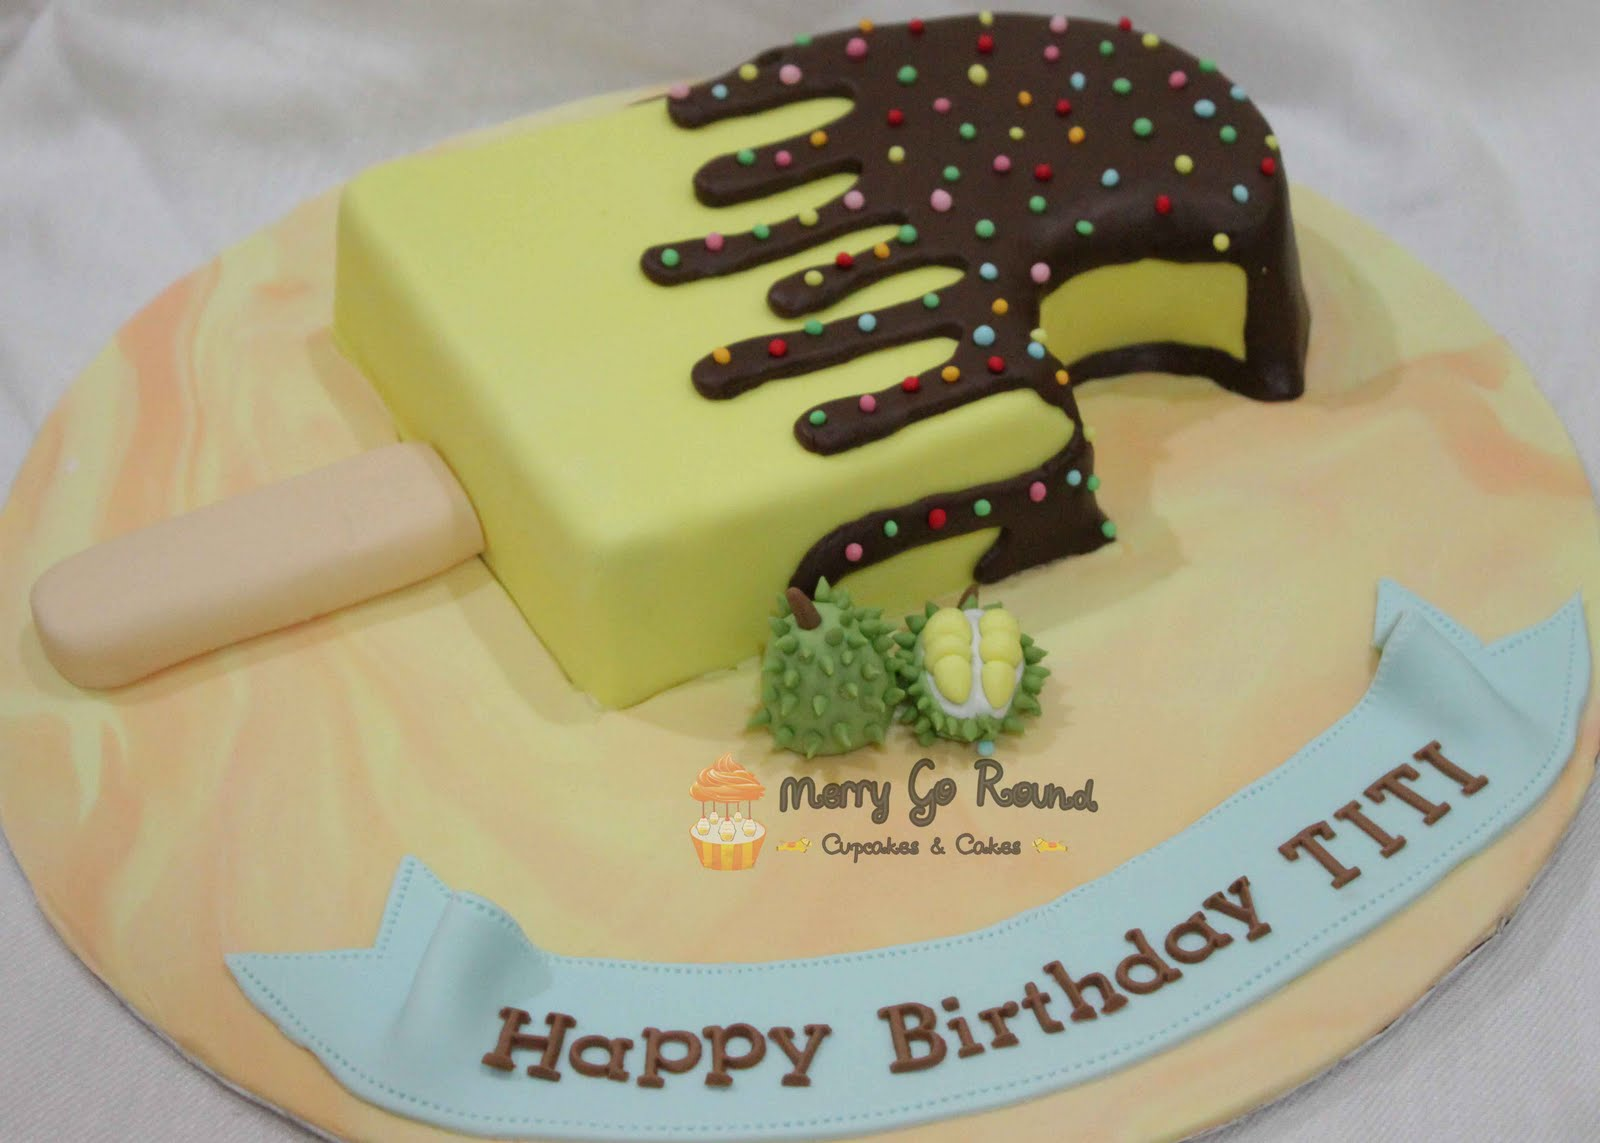 Merry Go Round - Cupcakes & Cakes: Durian Ice Cream Shaped ...